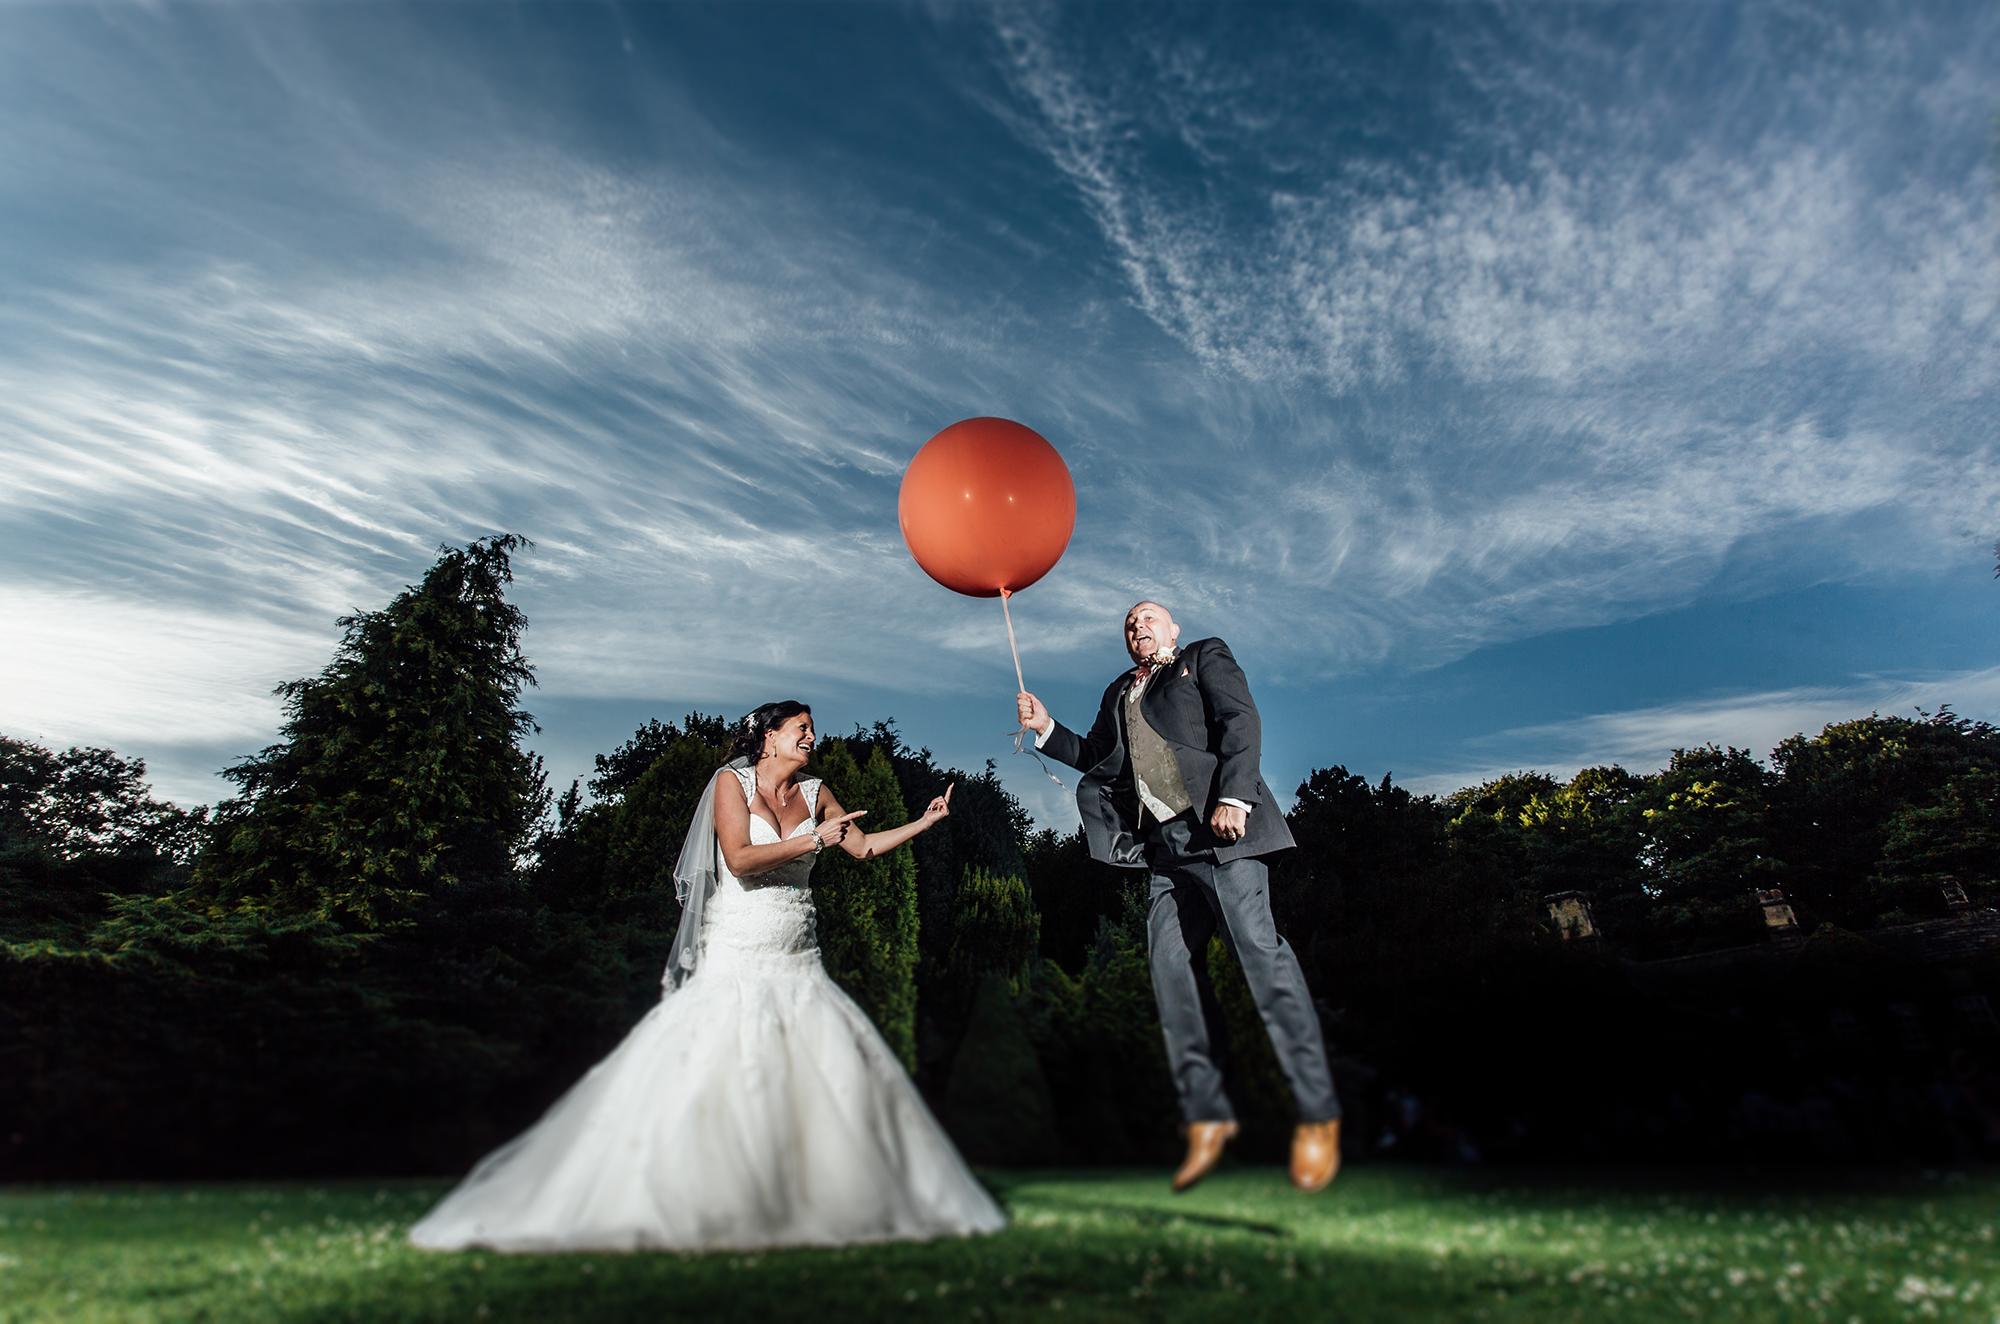 whitley+hall+wedding+photographer.jpg